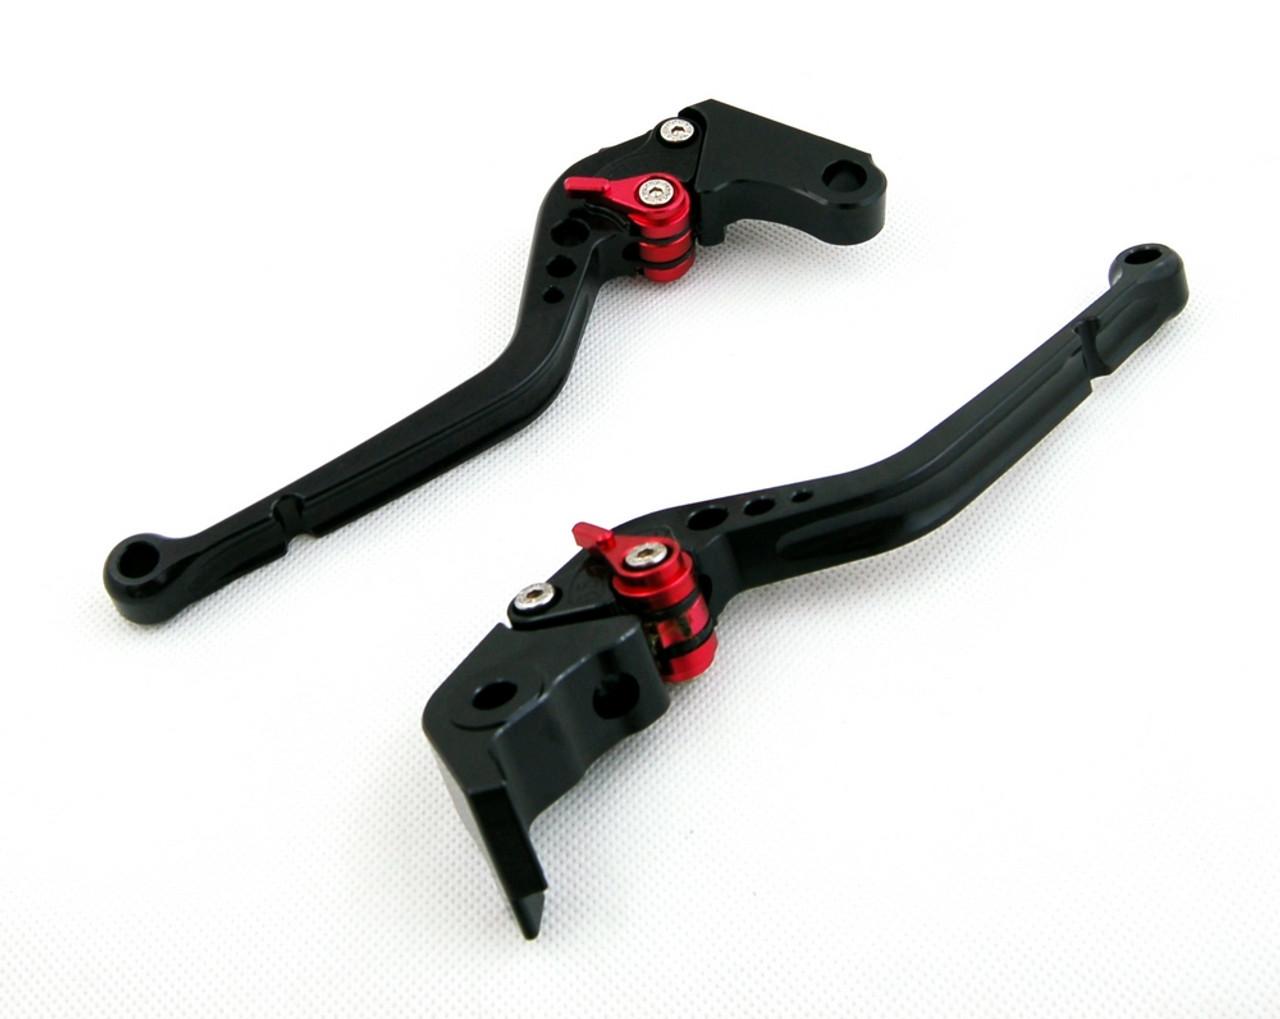 Long Brake Clutch Levers For Honda CB1000R 08-14 CBR1000RR/FIREBLADE 04-07 Black